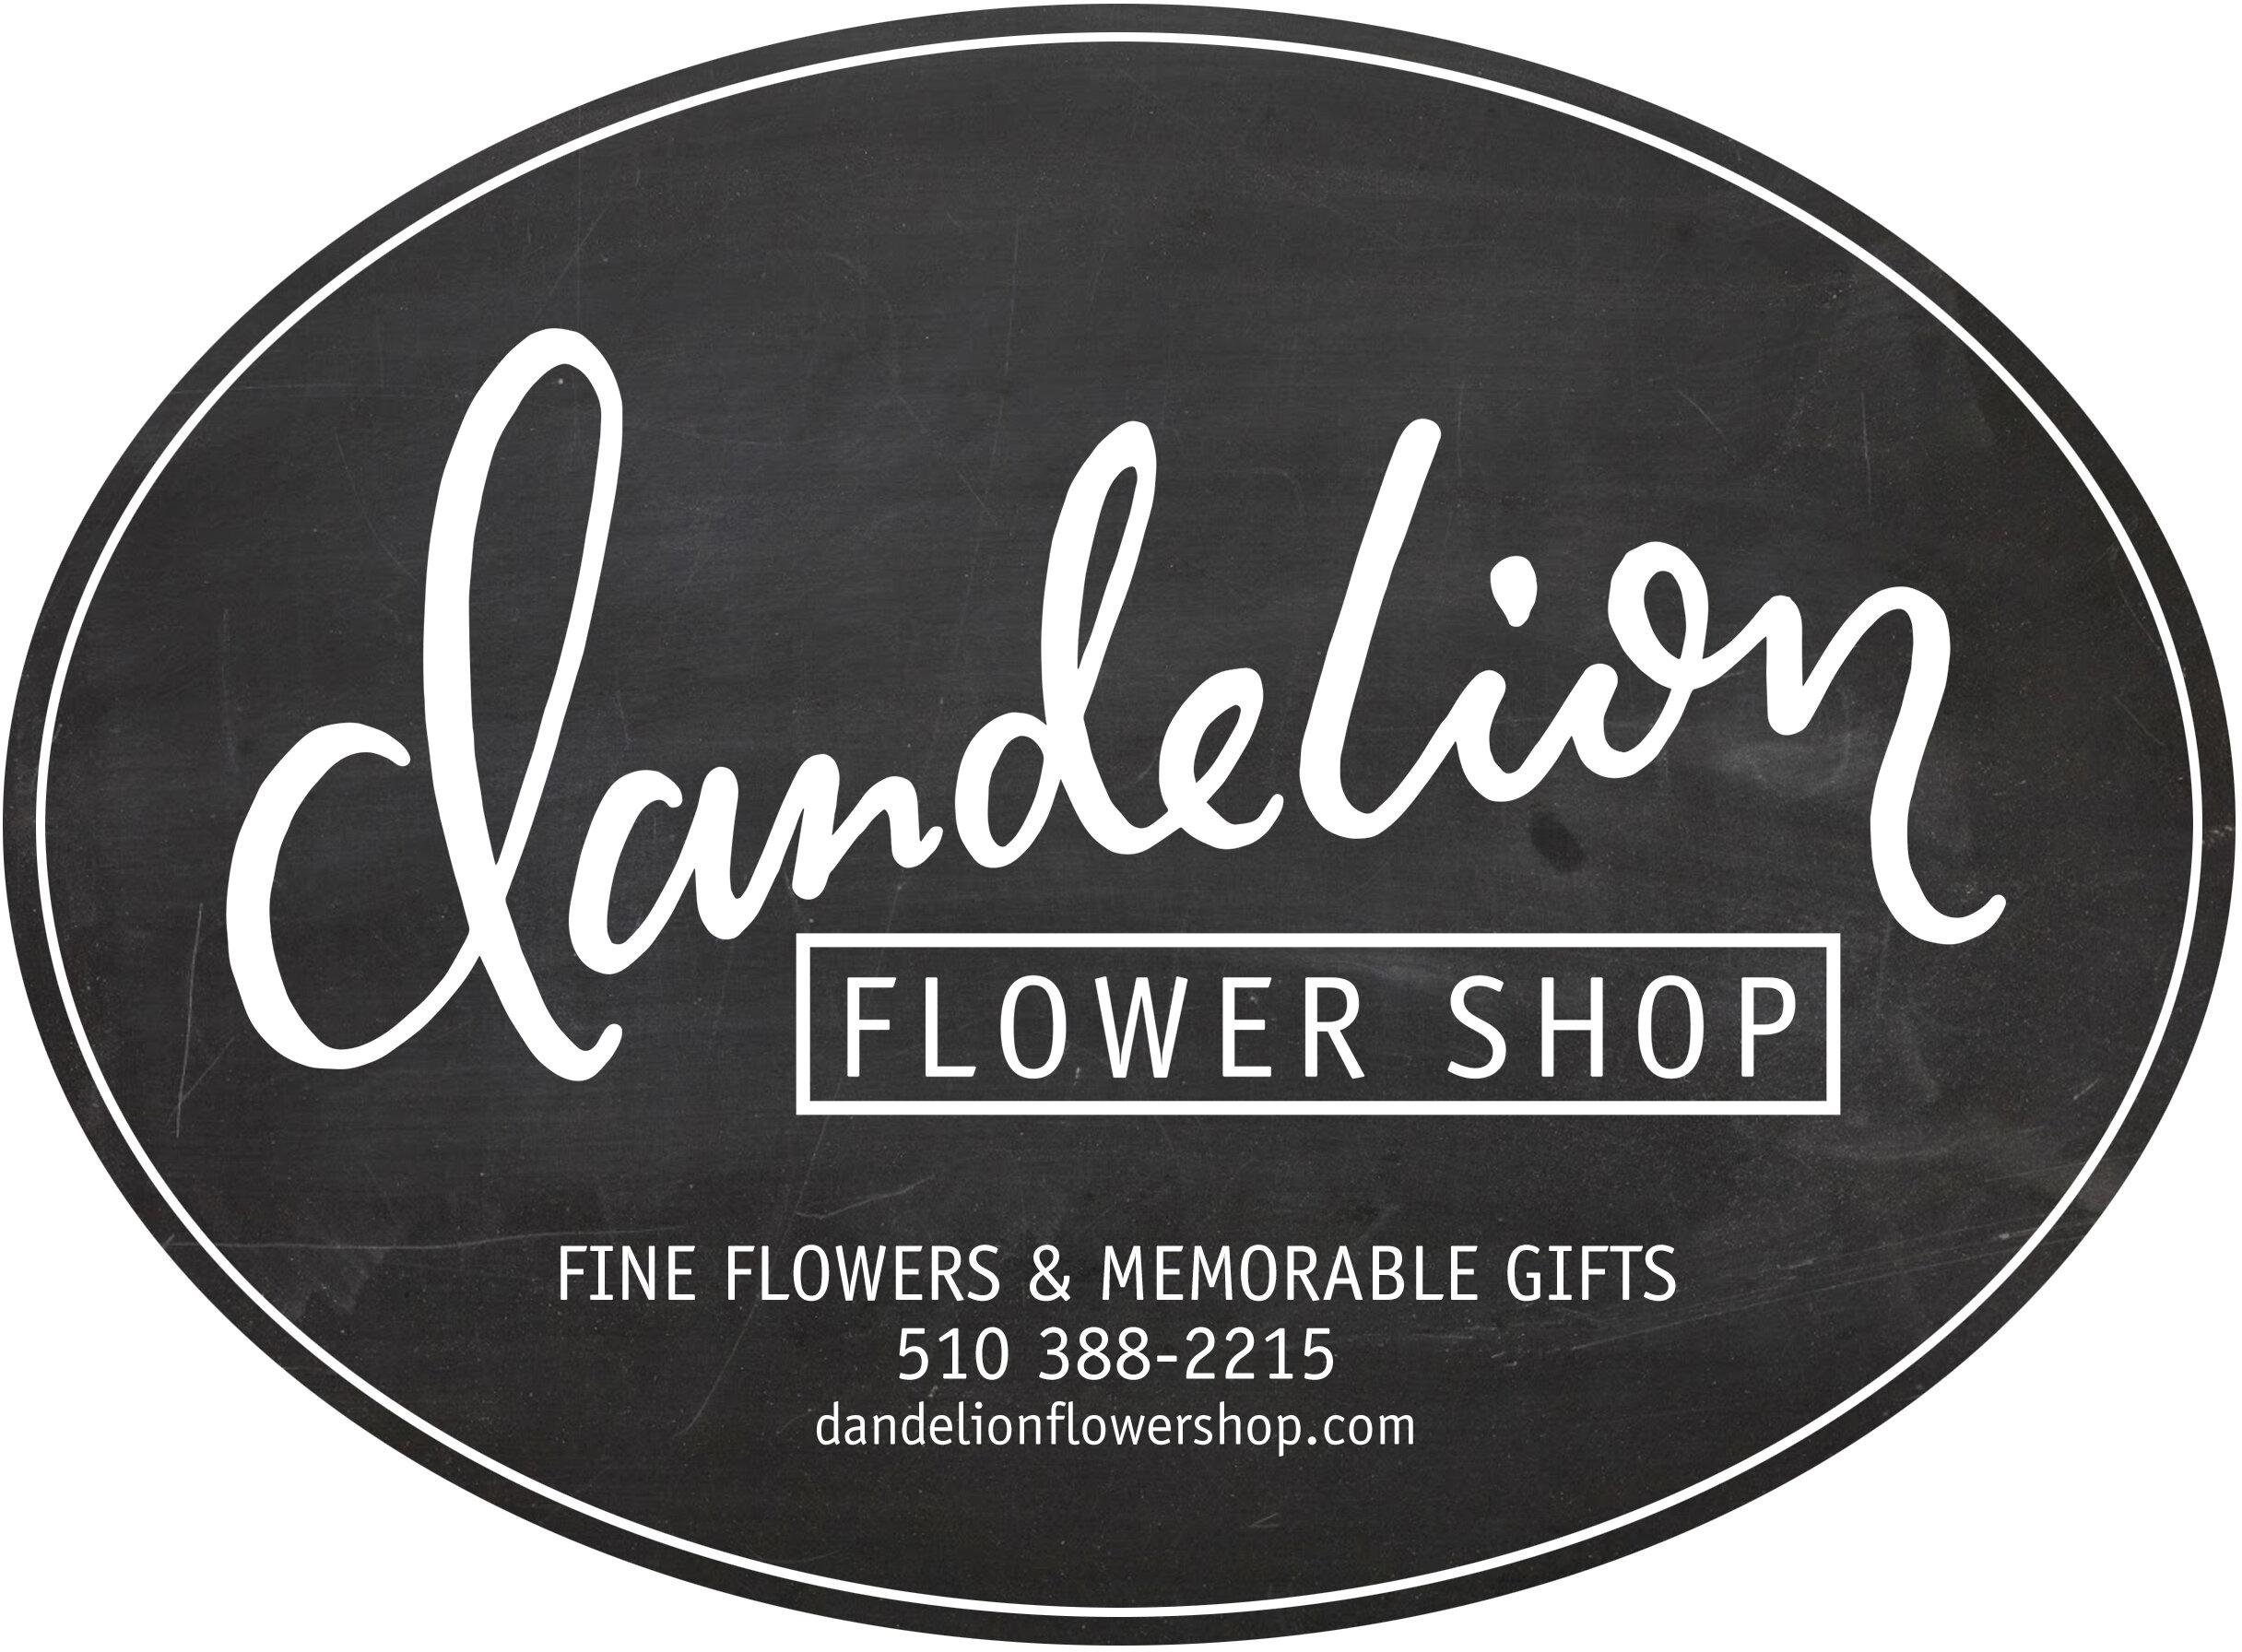 Dandelion_oval_logo.jpg